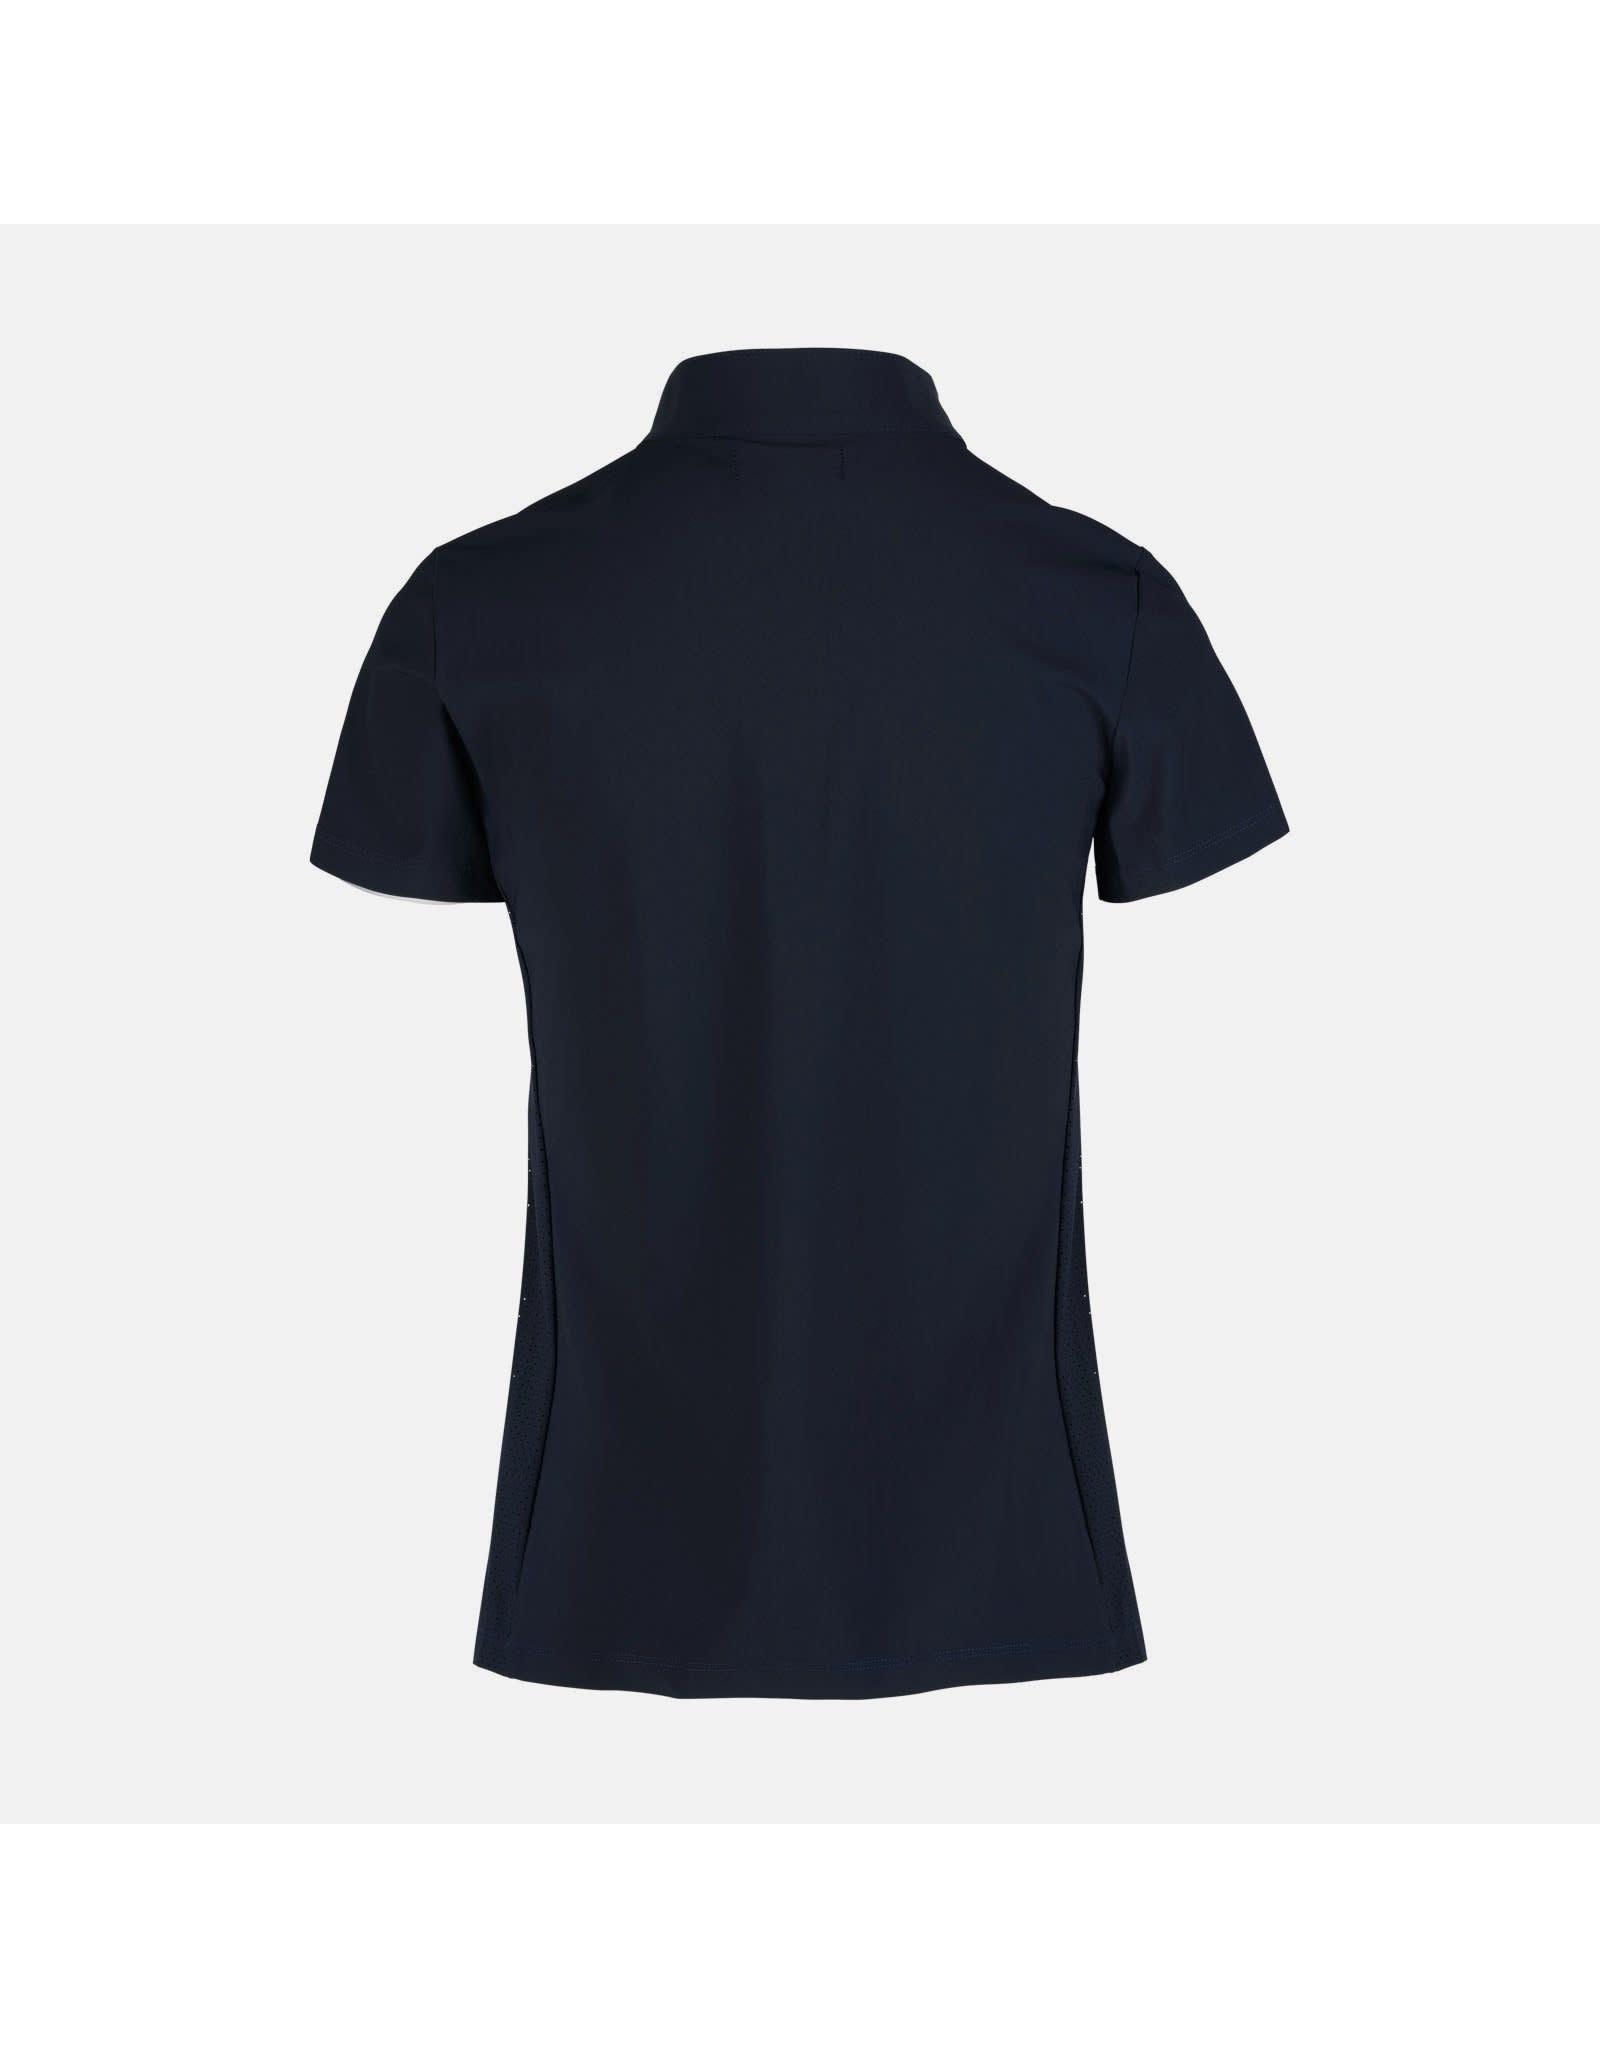 Horze Womens Saphira Ventilated Training Short Sleeve Shirt